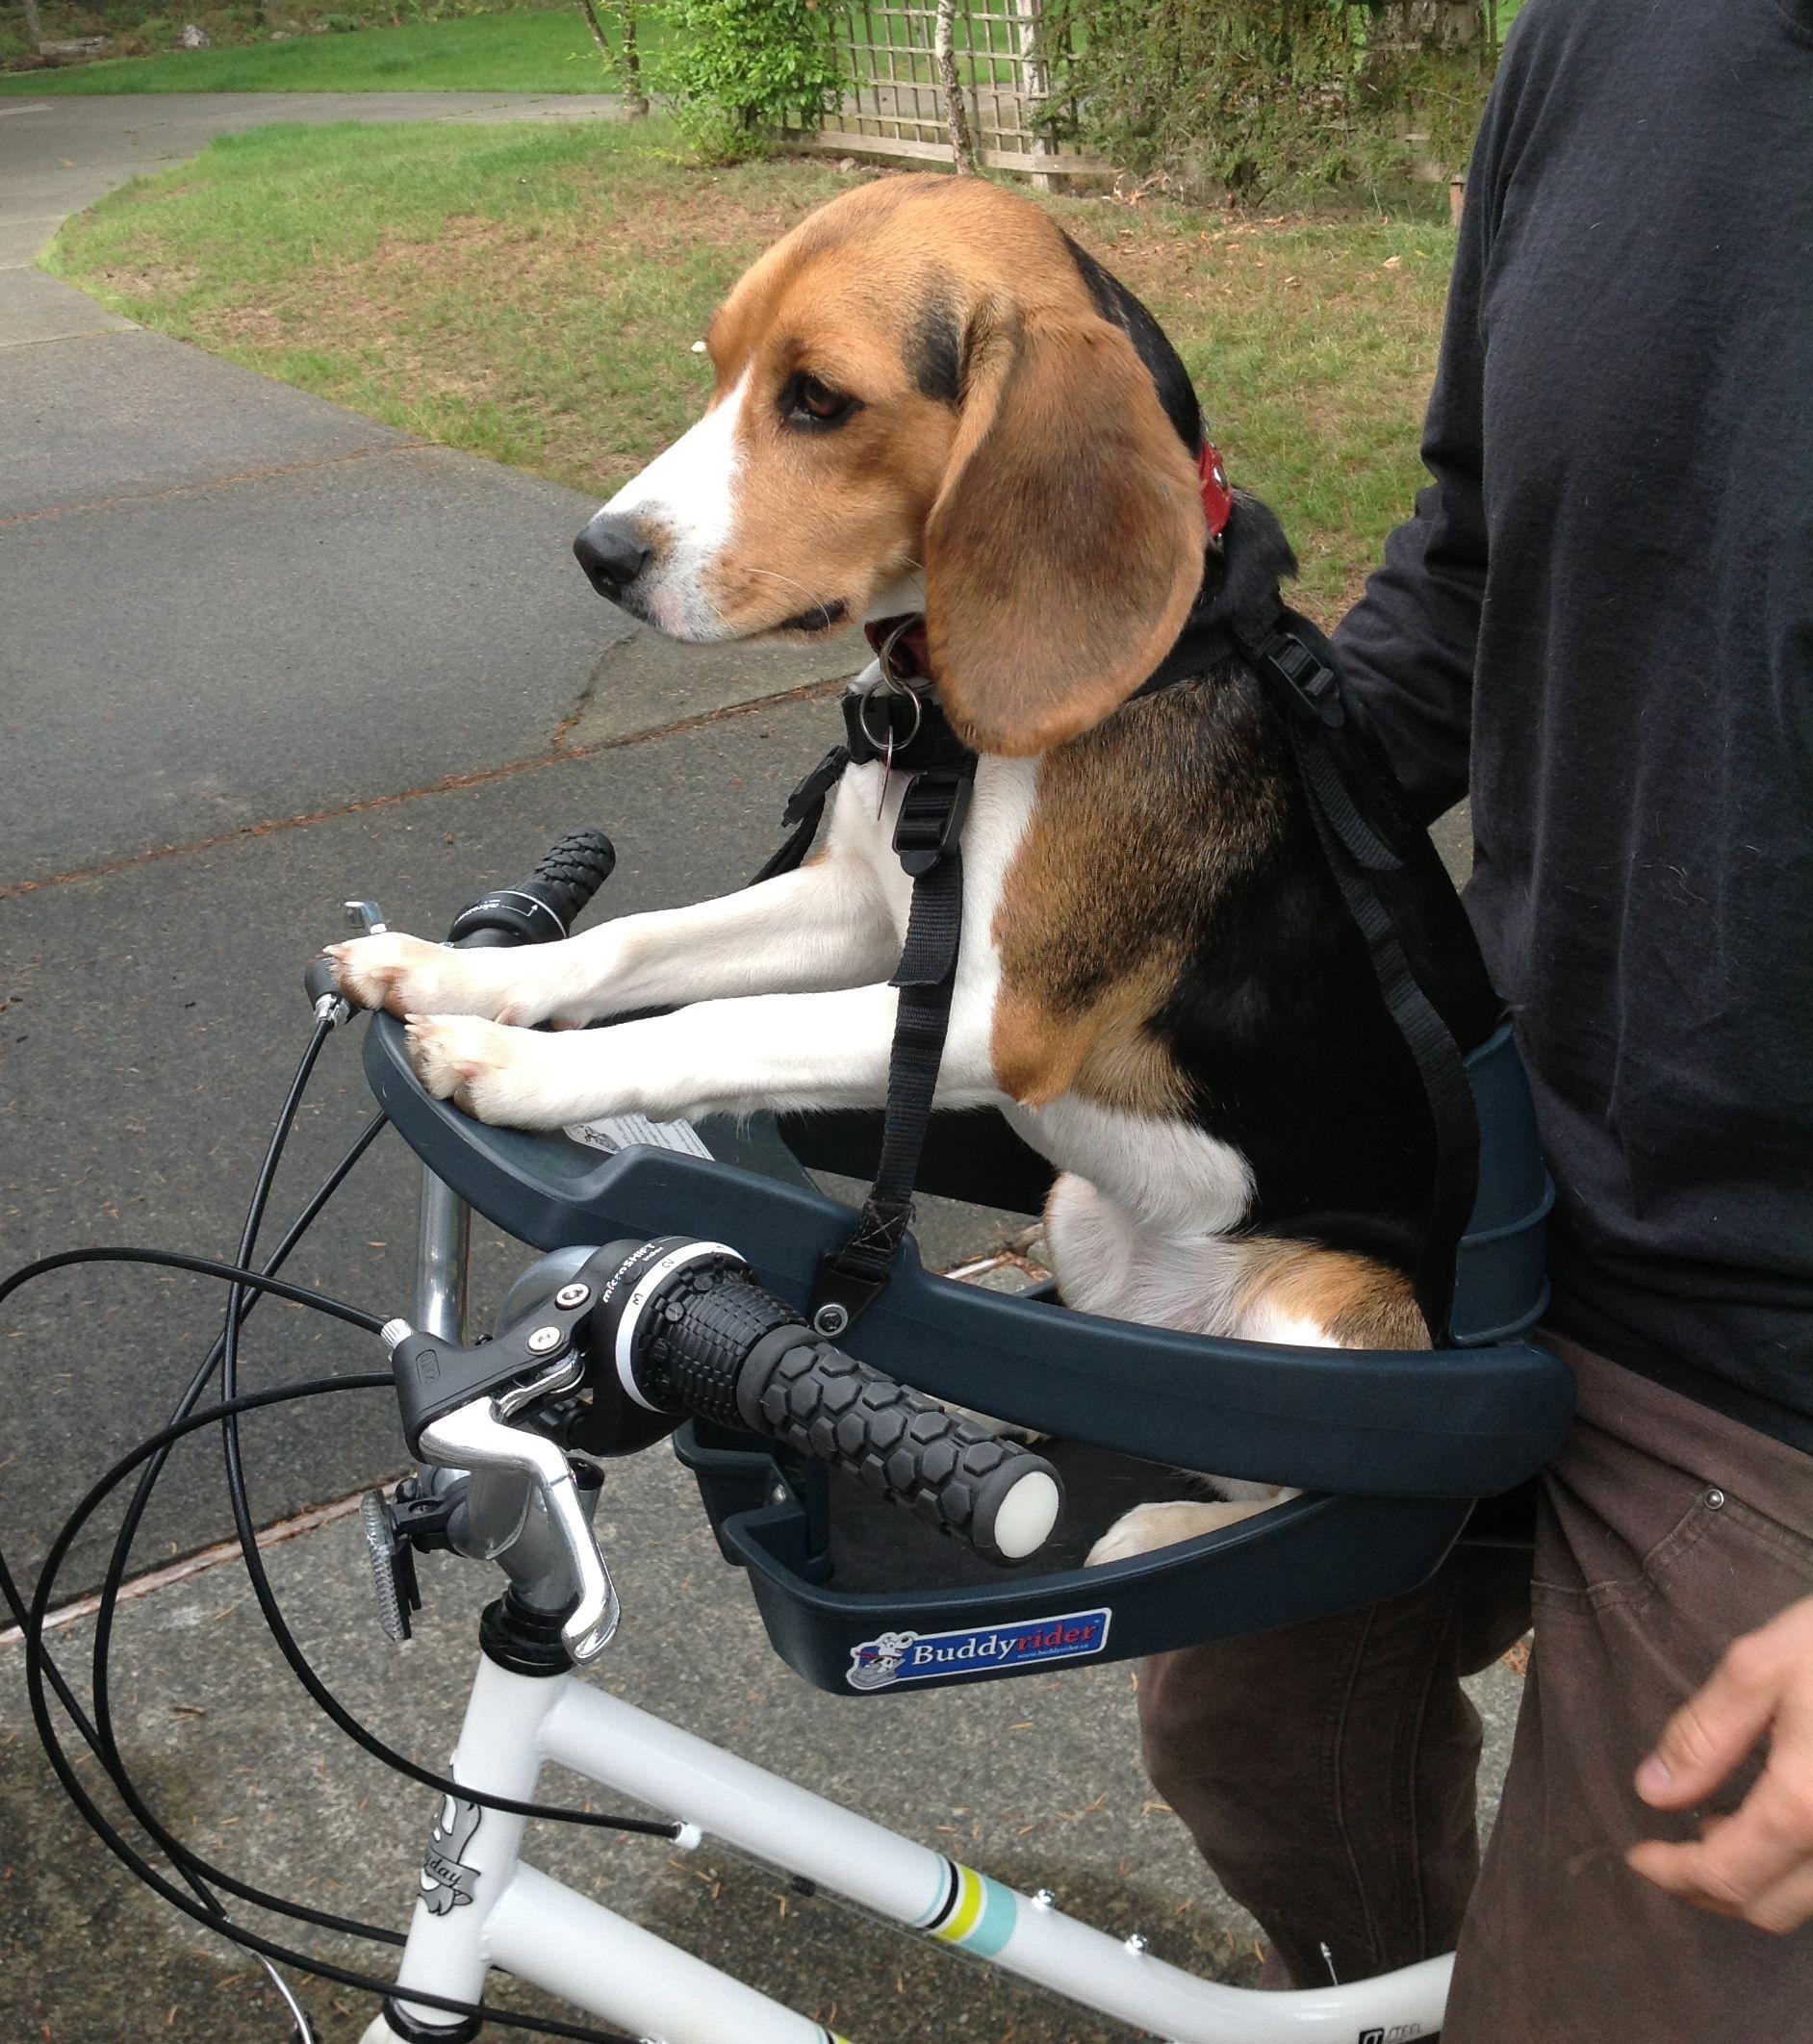 Pin By The Dog Outdoors On Buddyrider Dog Bike Seat Biking With